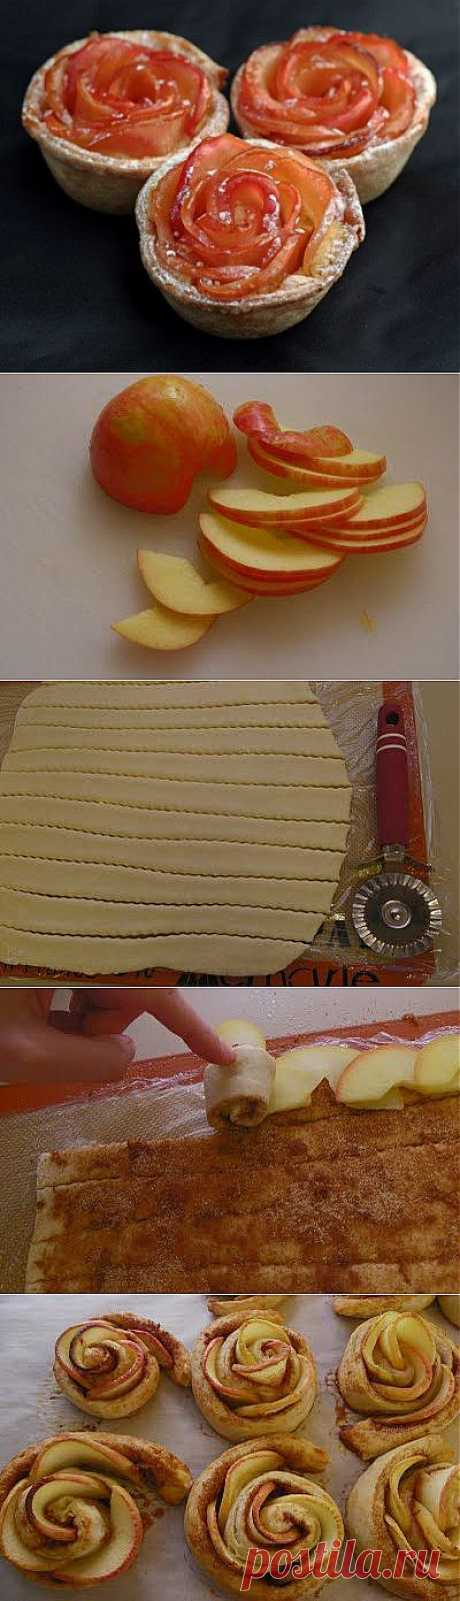 Булочки с корицей и яблоками